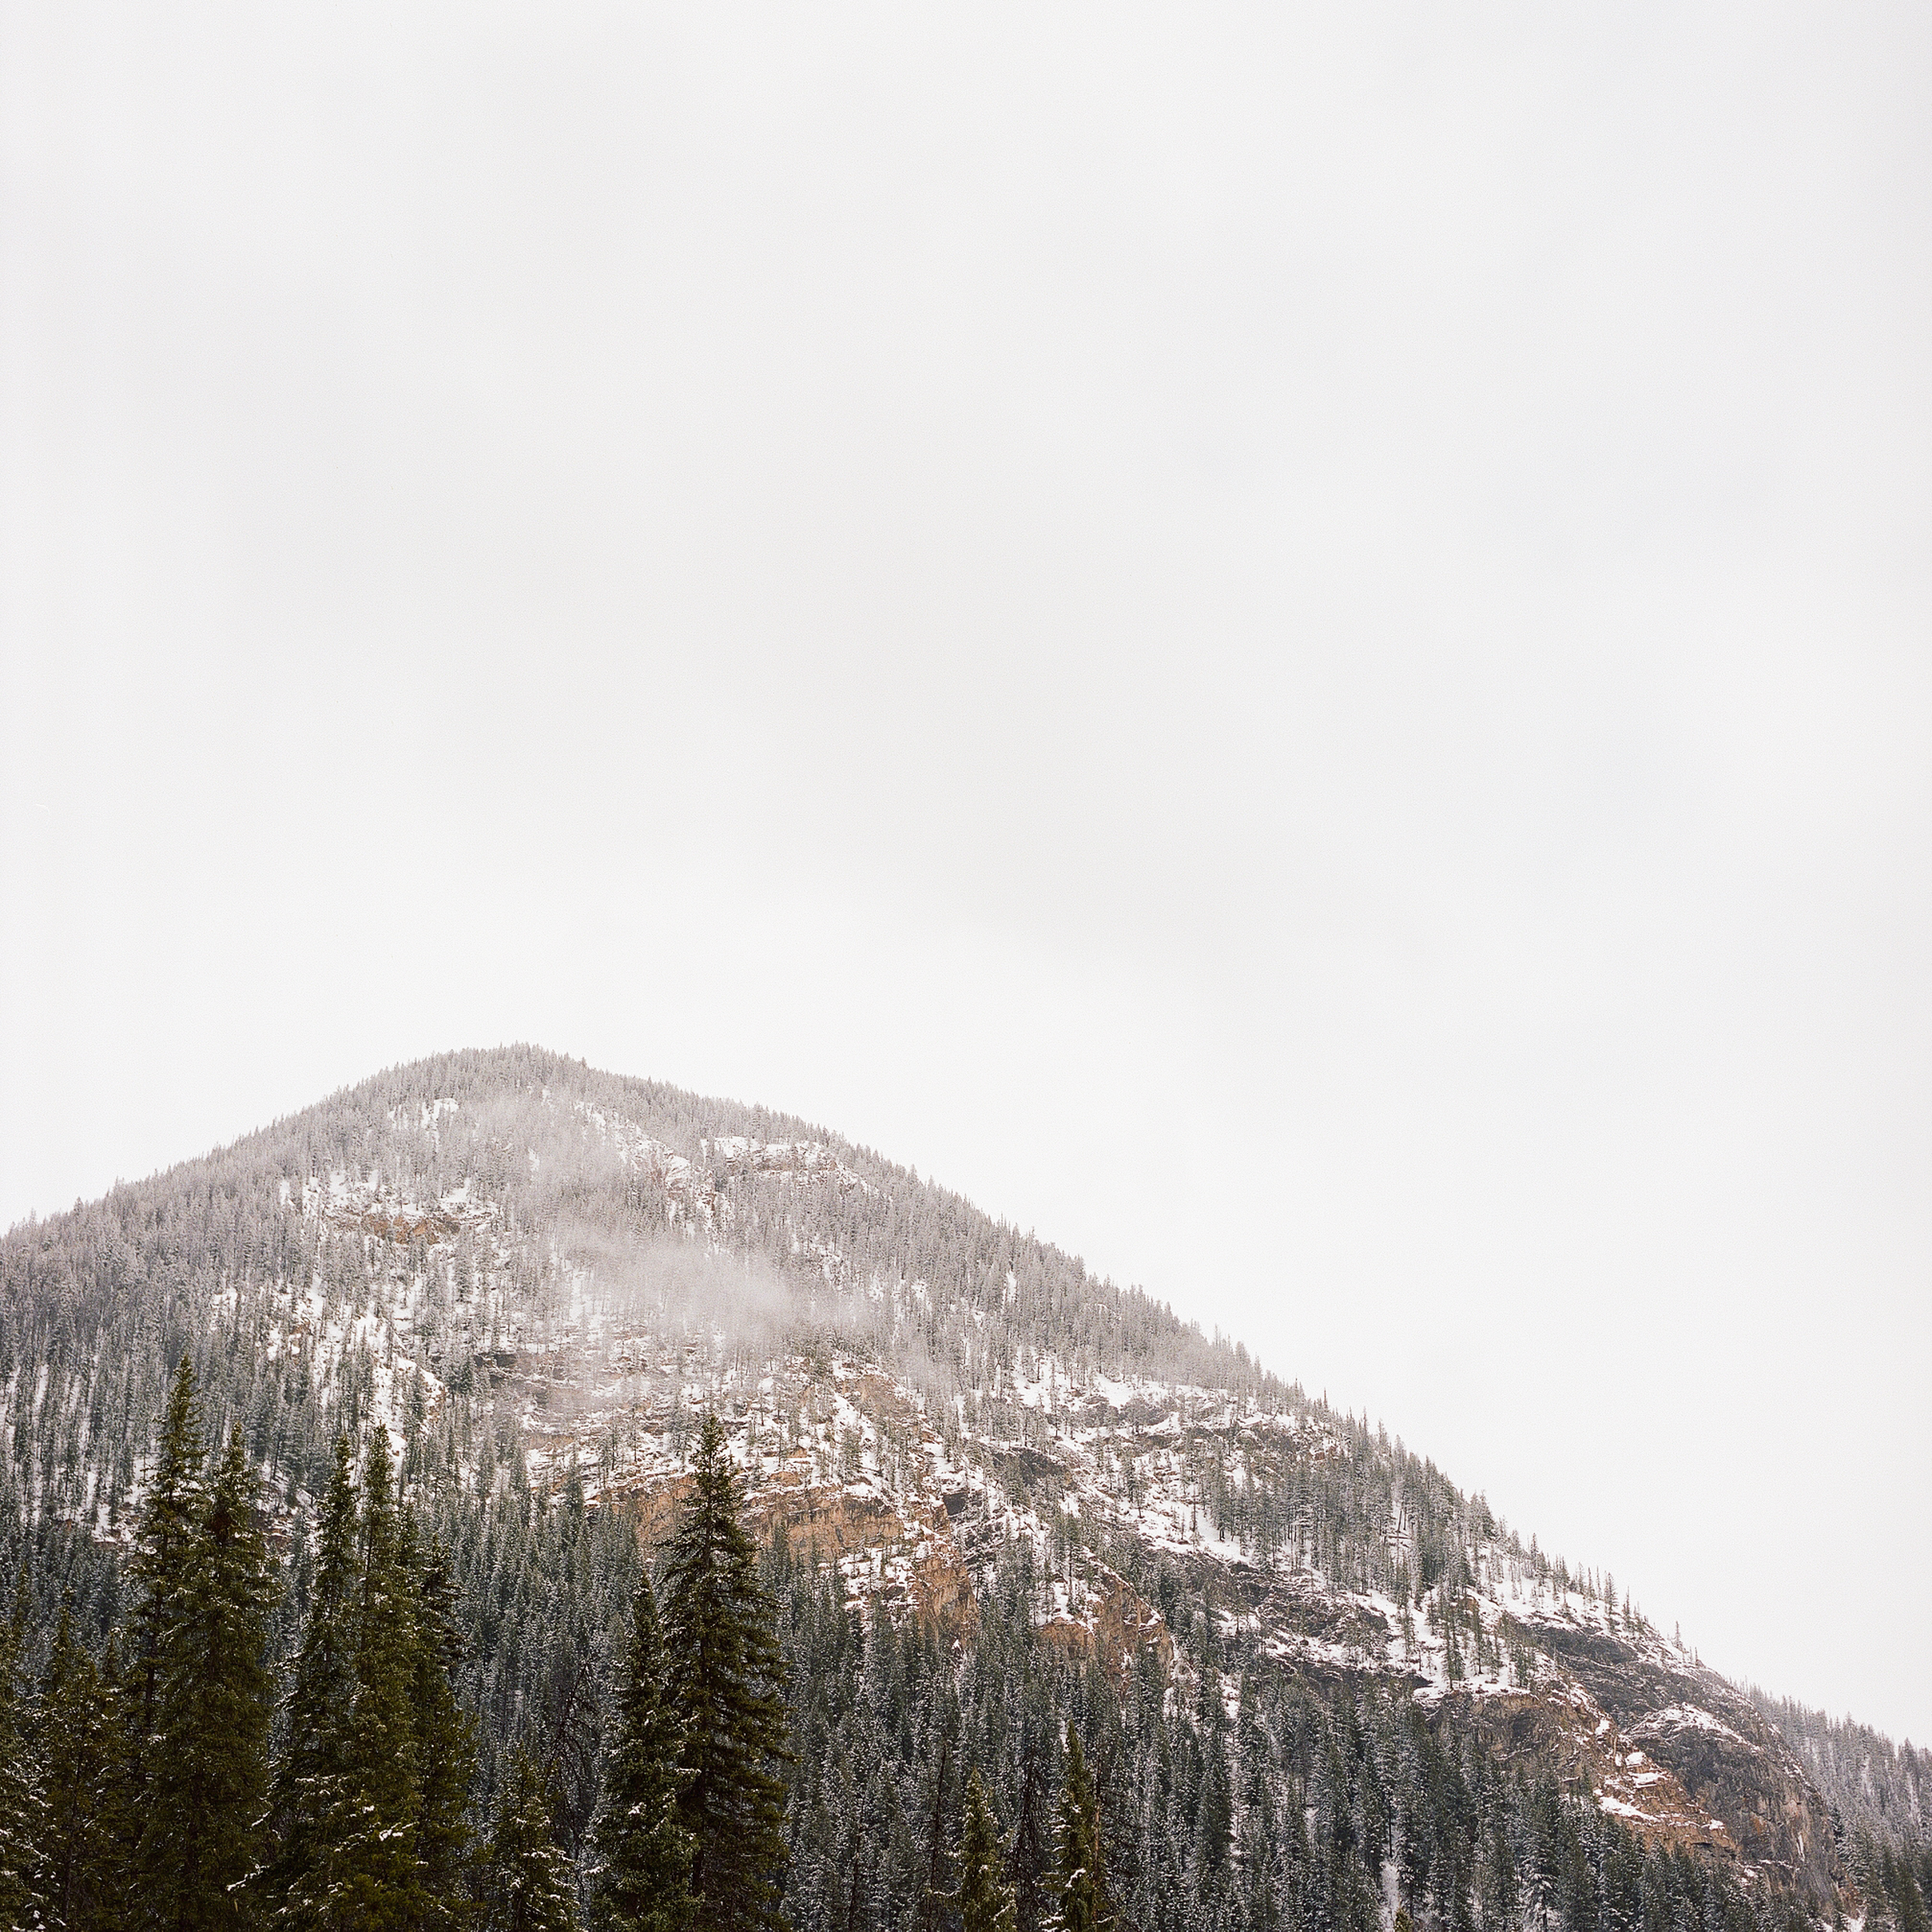 Banff_2018-1.jpg